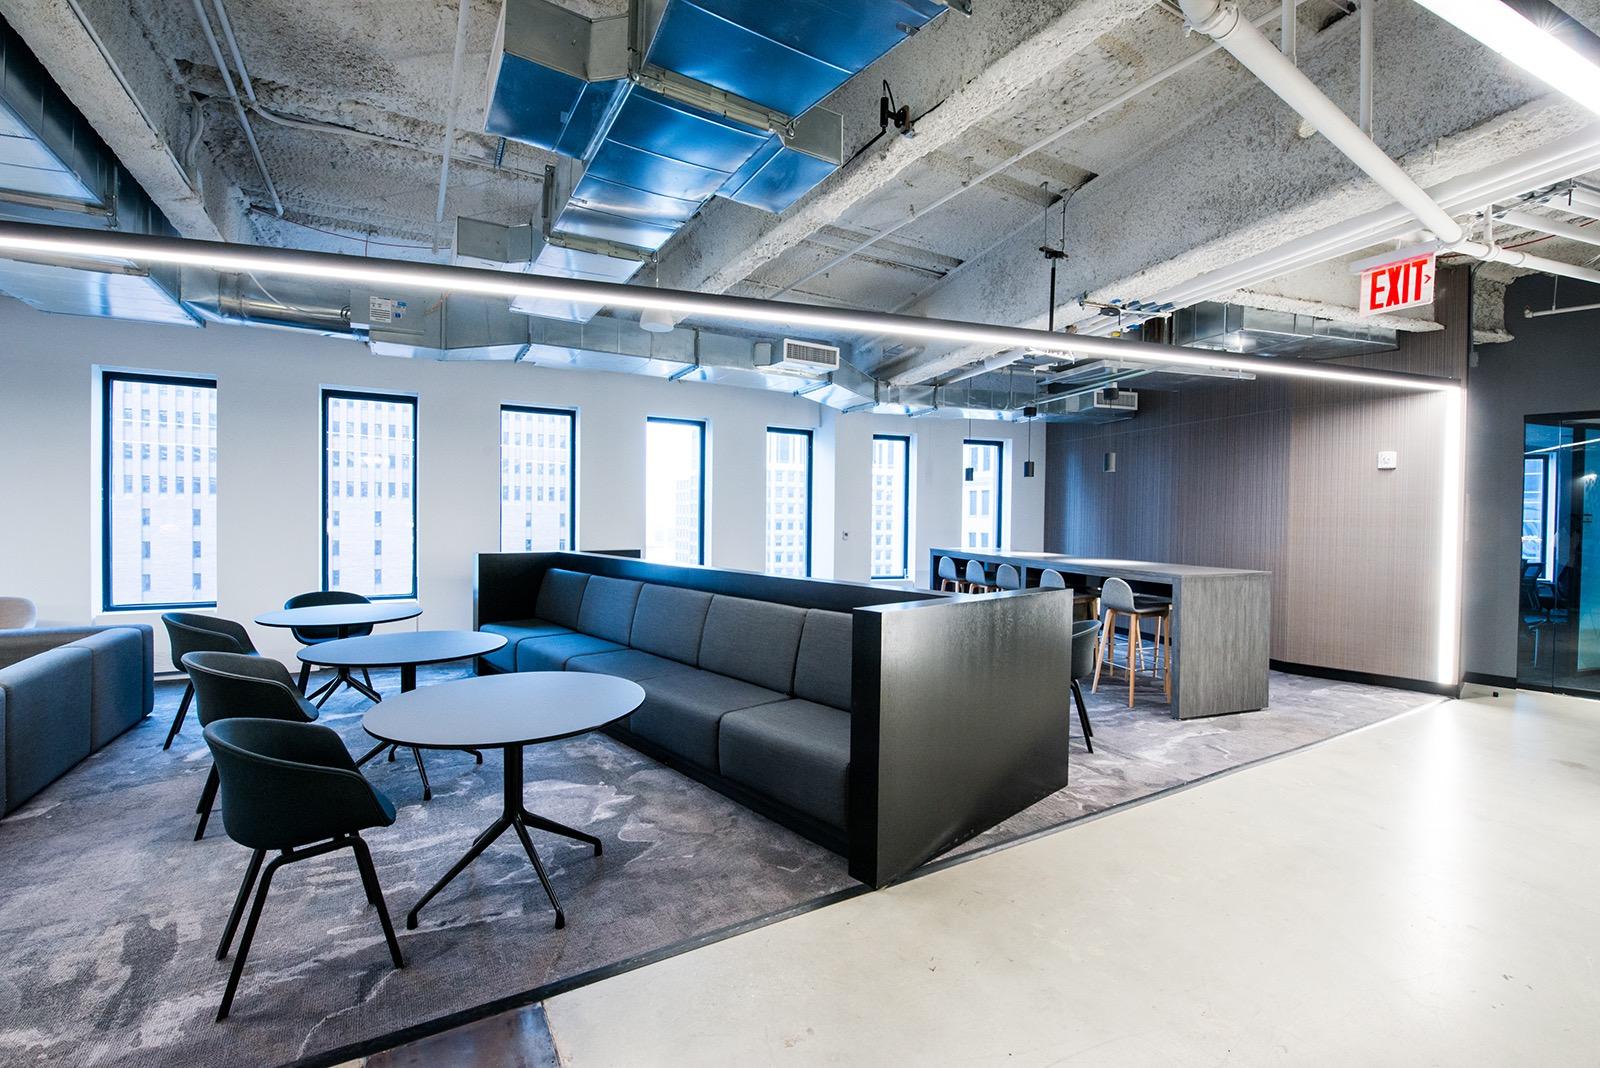 vox-media-nyc-office-7